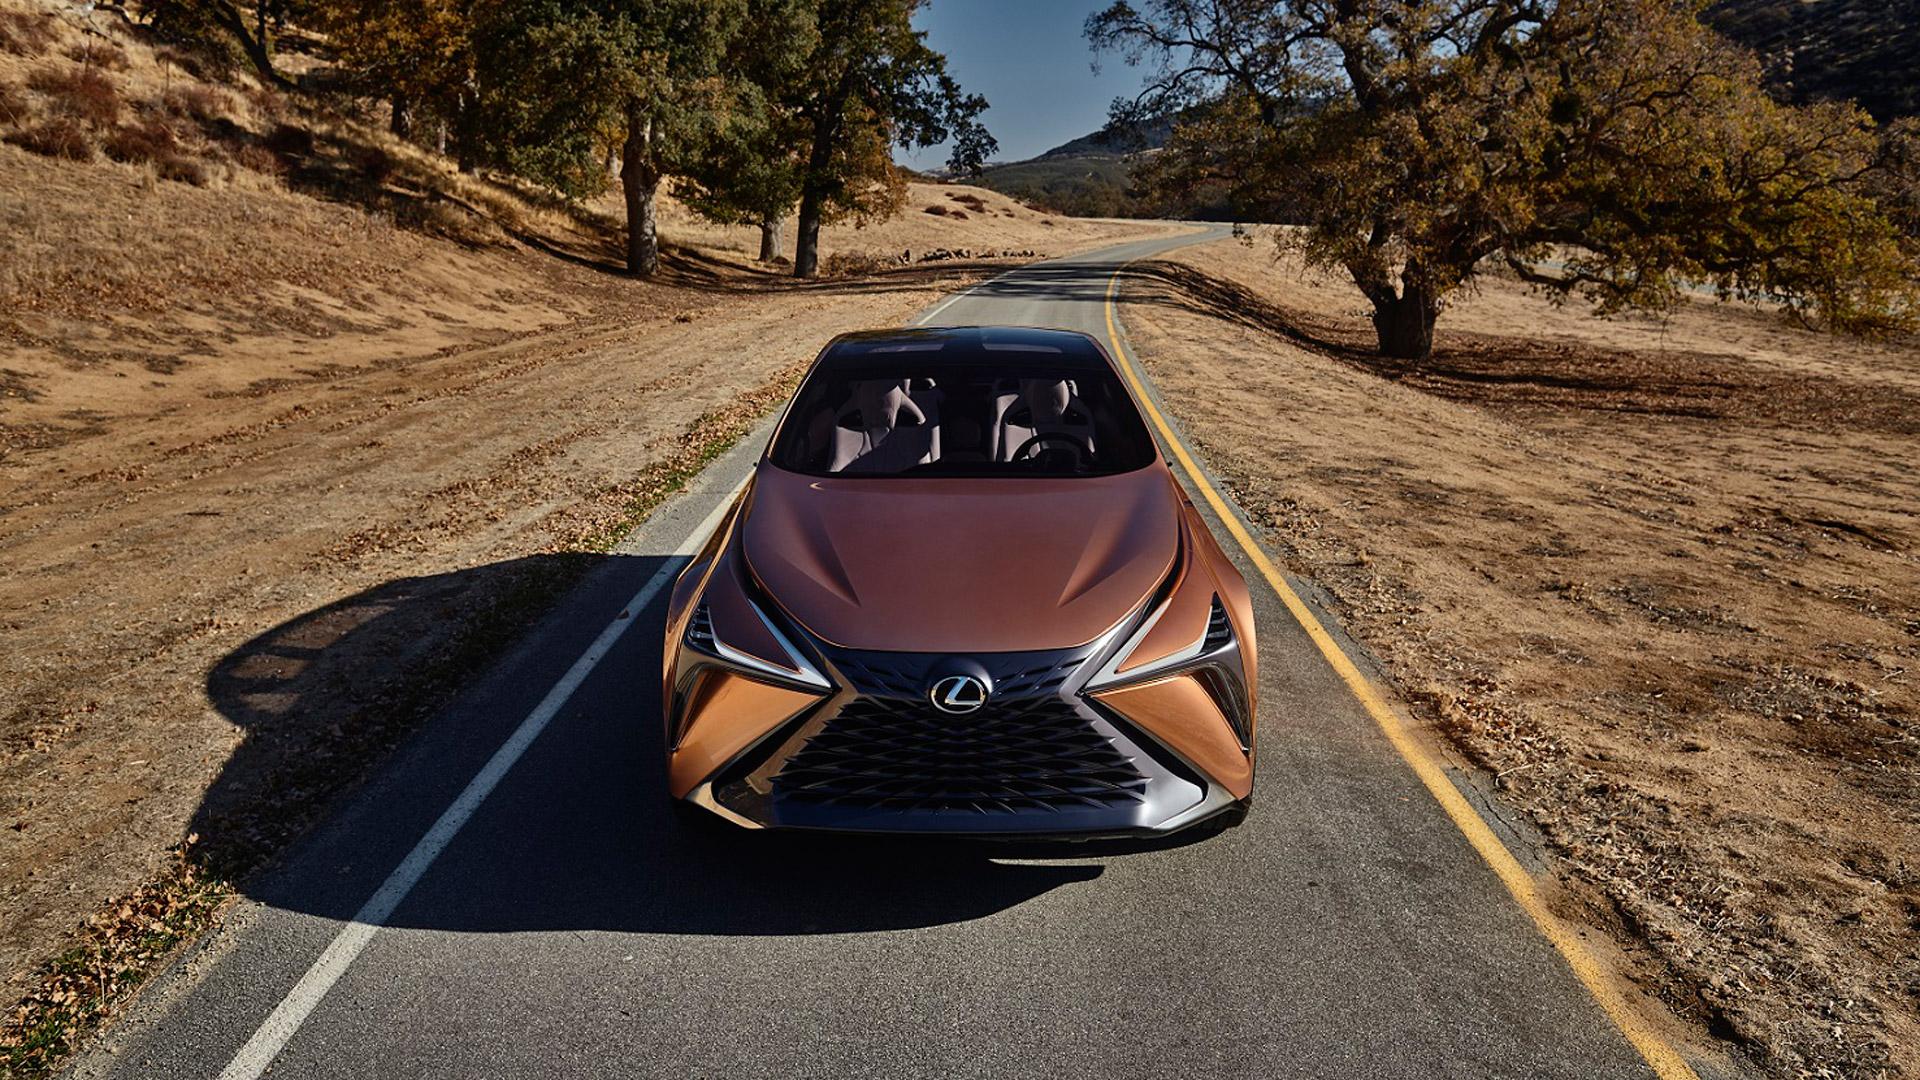 Lexus_LF1_Limitless-05_tcm-3176-1244940